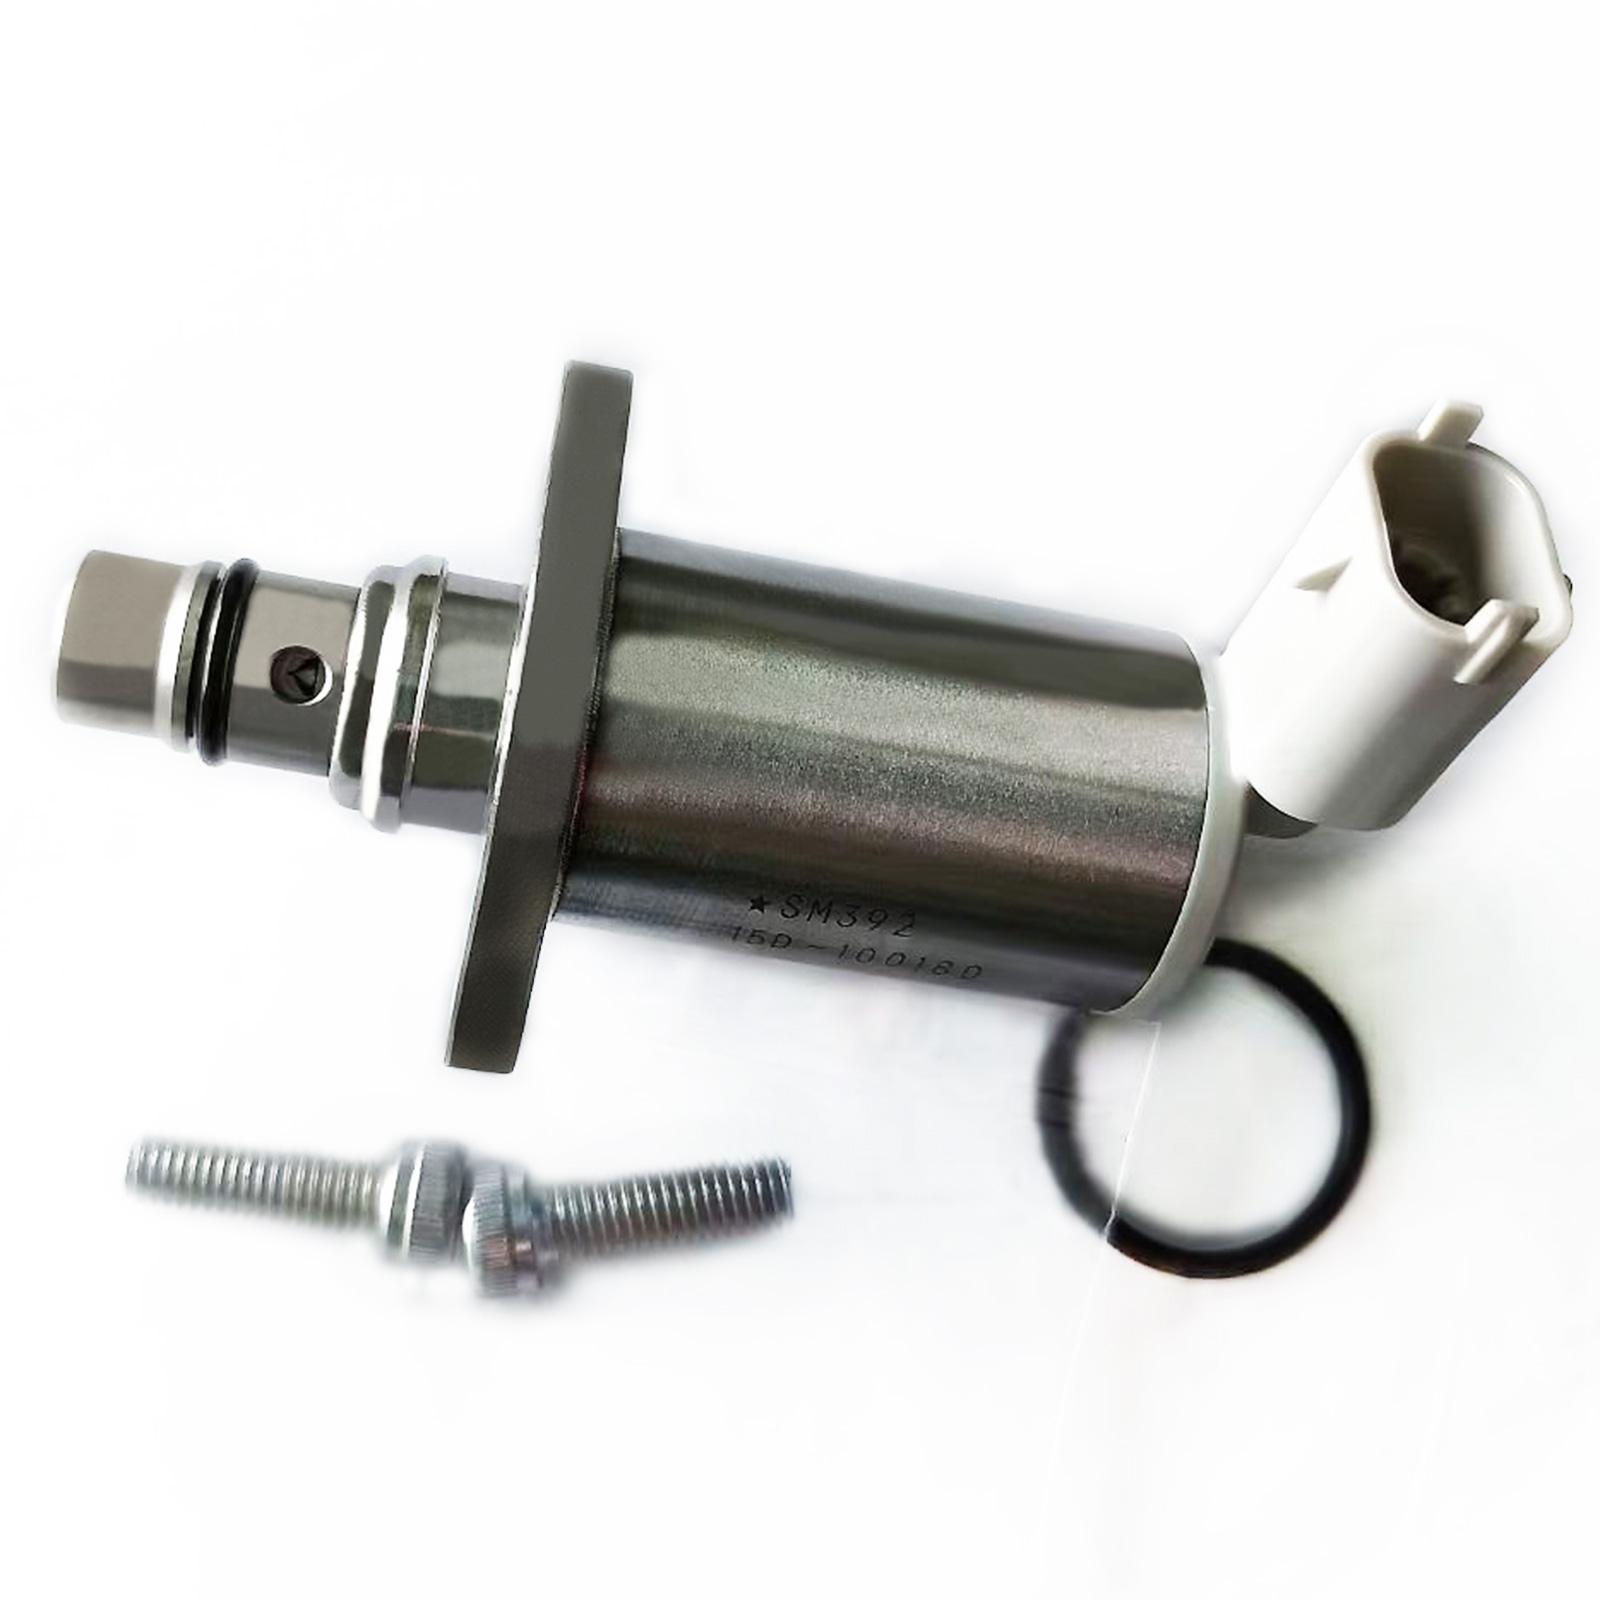 5WMK97357 Nox Sensor nitrogen Oxygen Sensor 441-5130 Compatible for Caterpillar C13 C15 C18 C4.4 C7.1 Engine